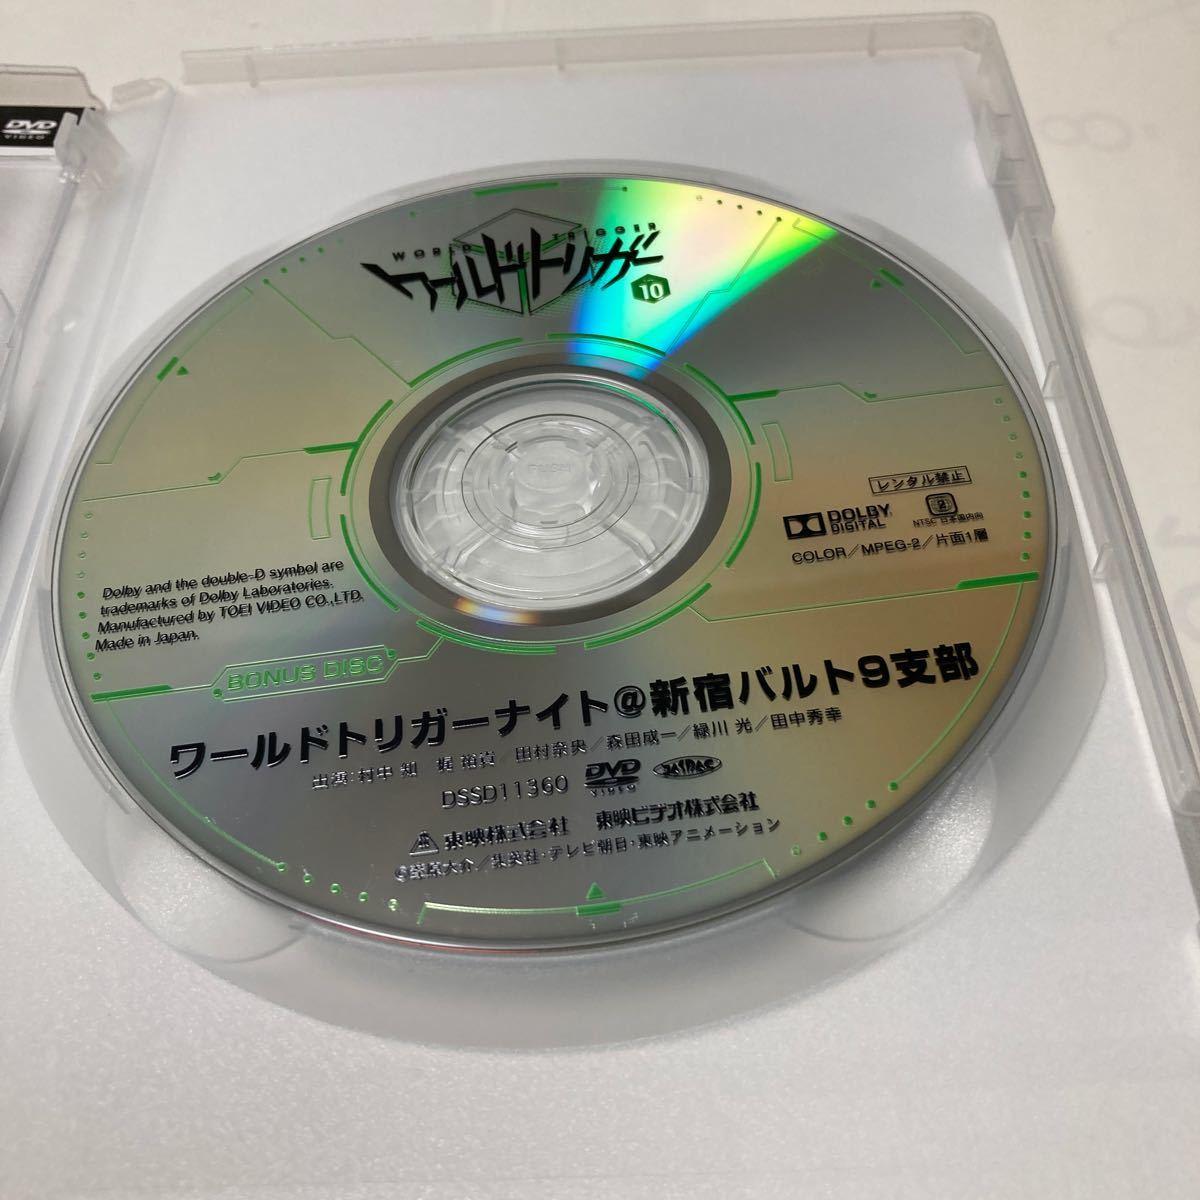 DVD ワールドトリガー VOL.10 [東映]